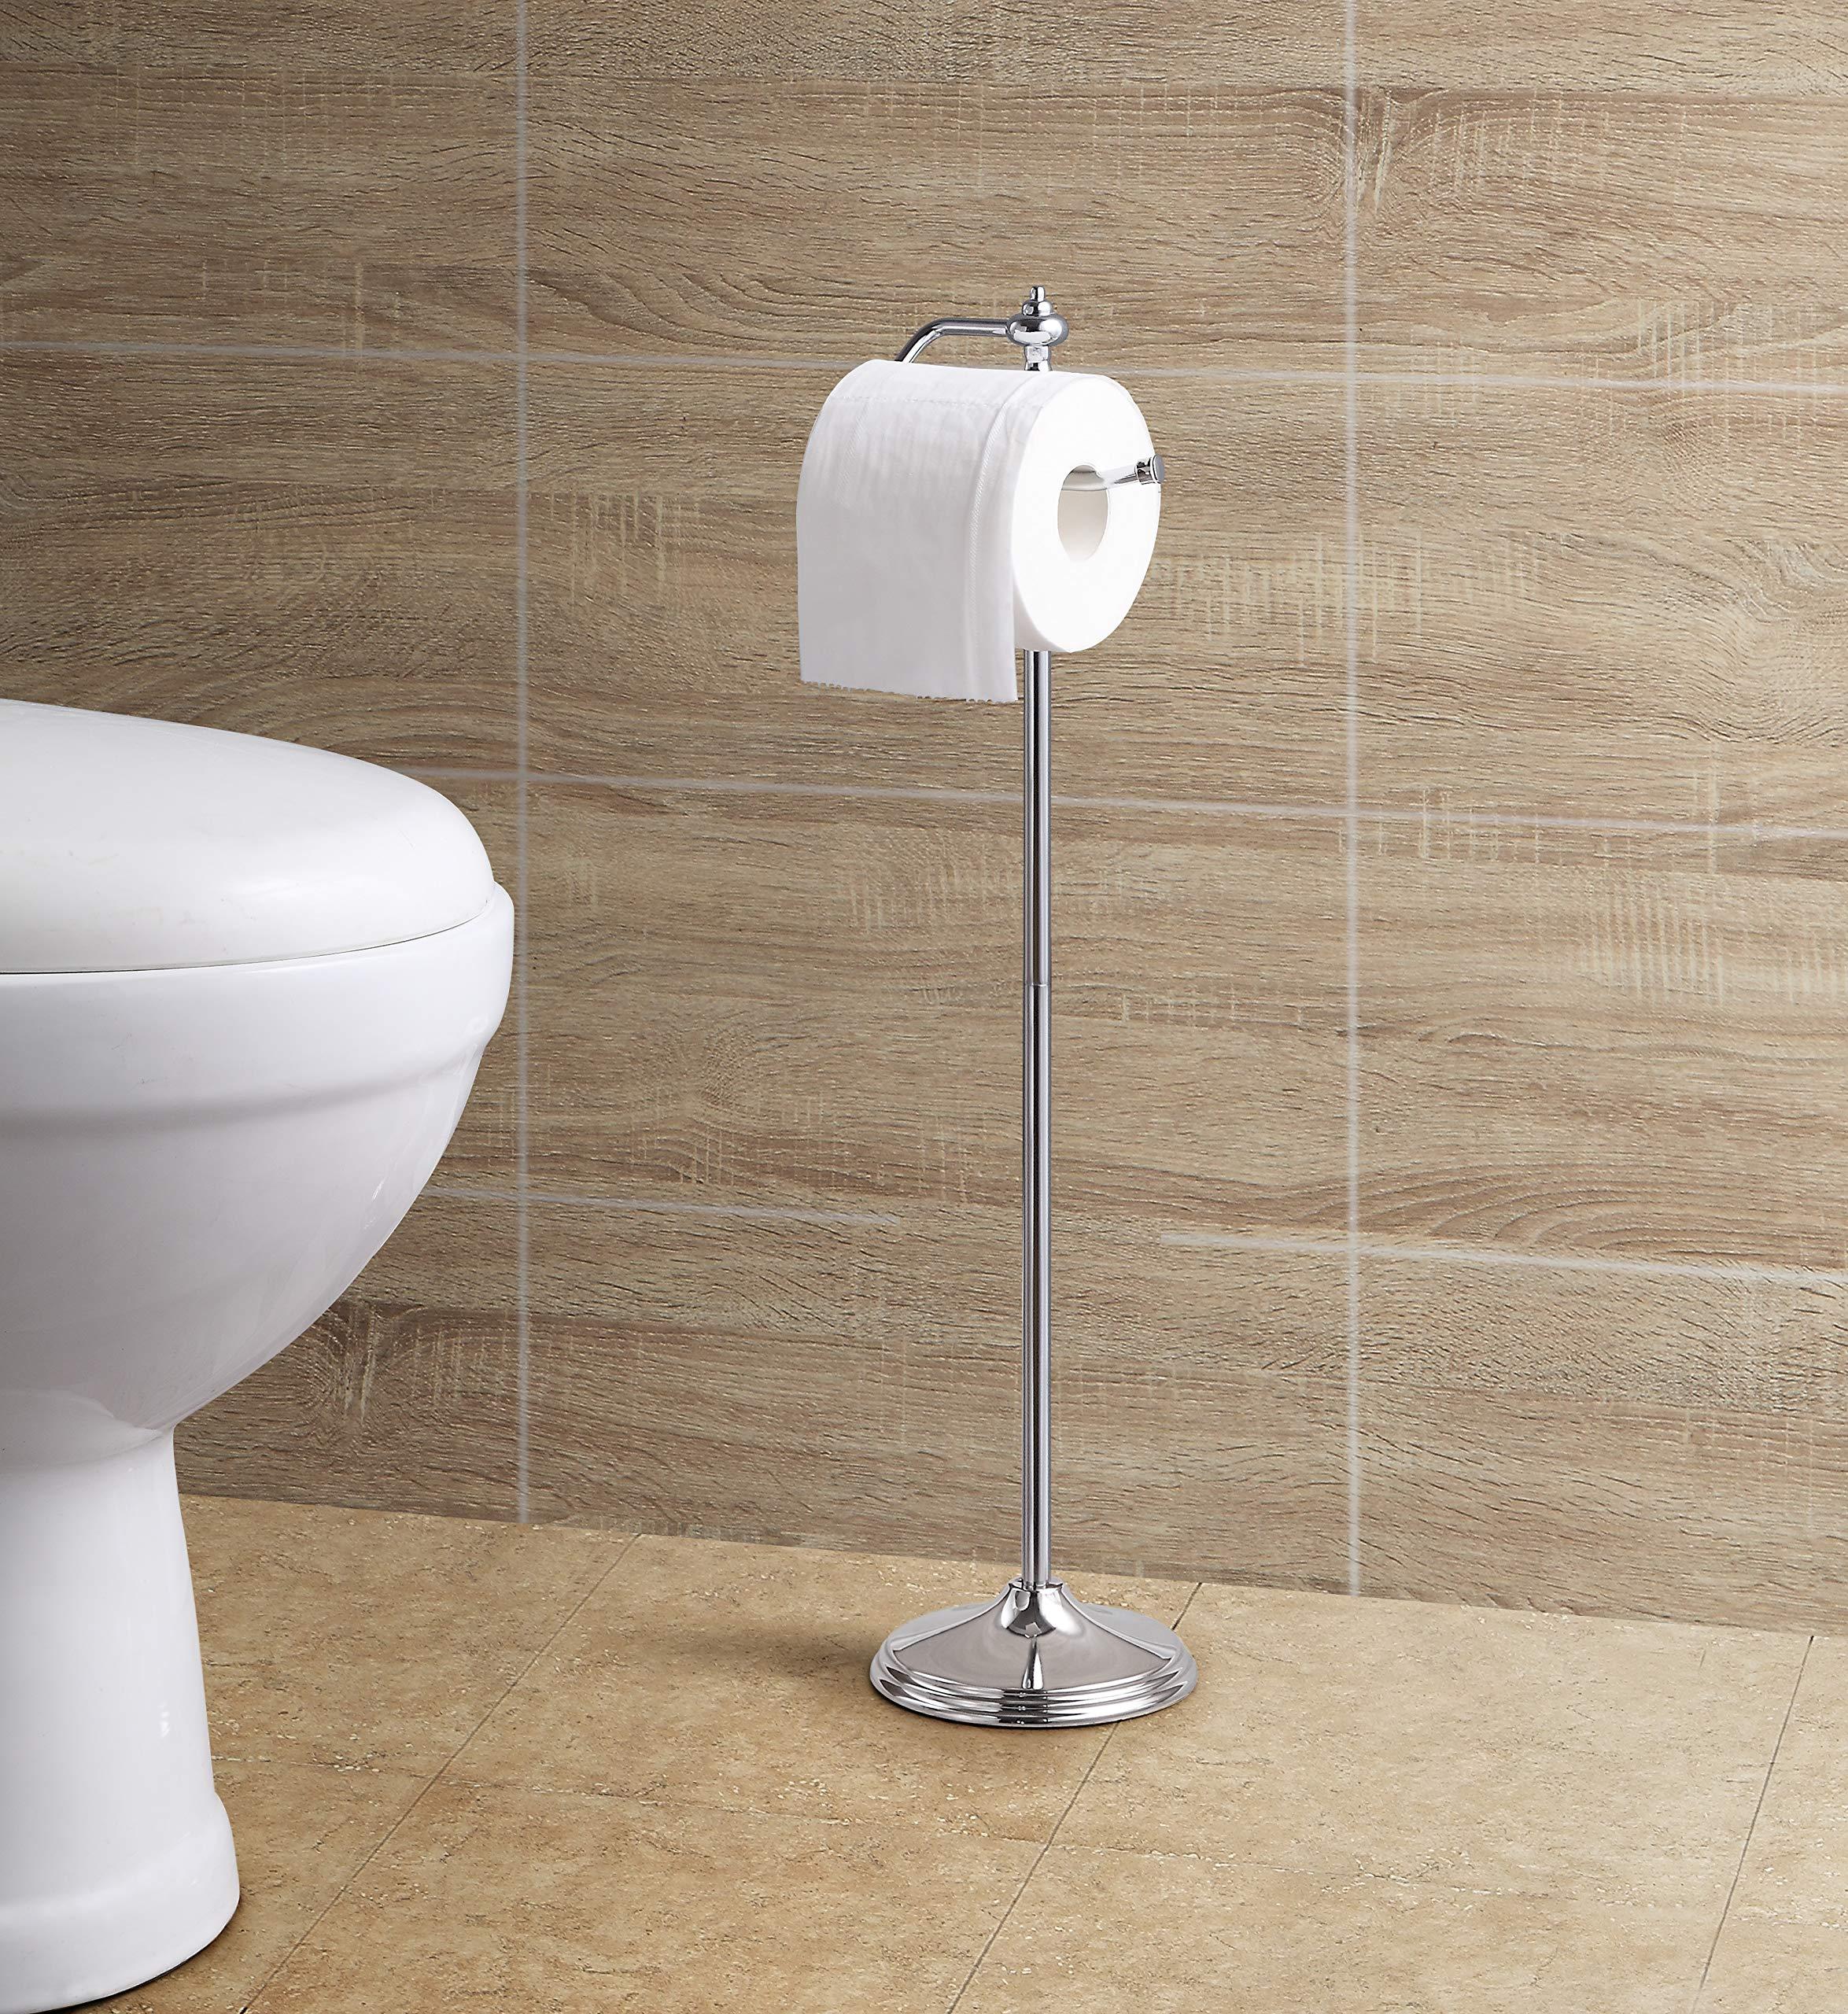 Sunnypoint bathroom free standing toilet tissue paper roll - Bathroom toilet paper holder free standing ...